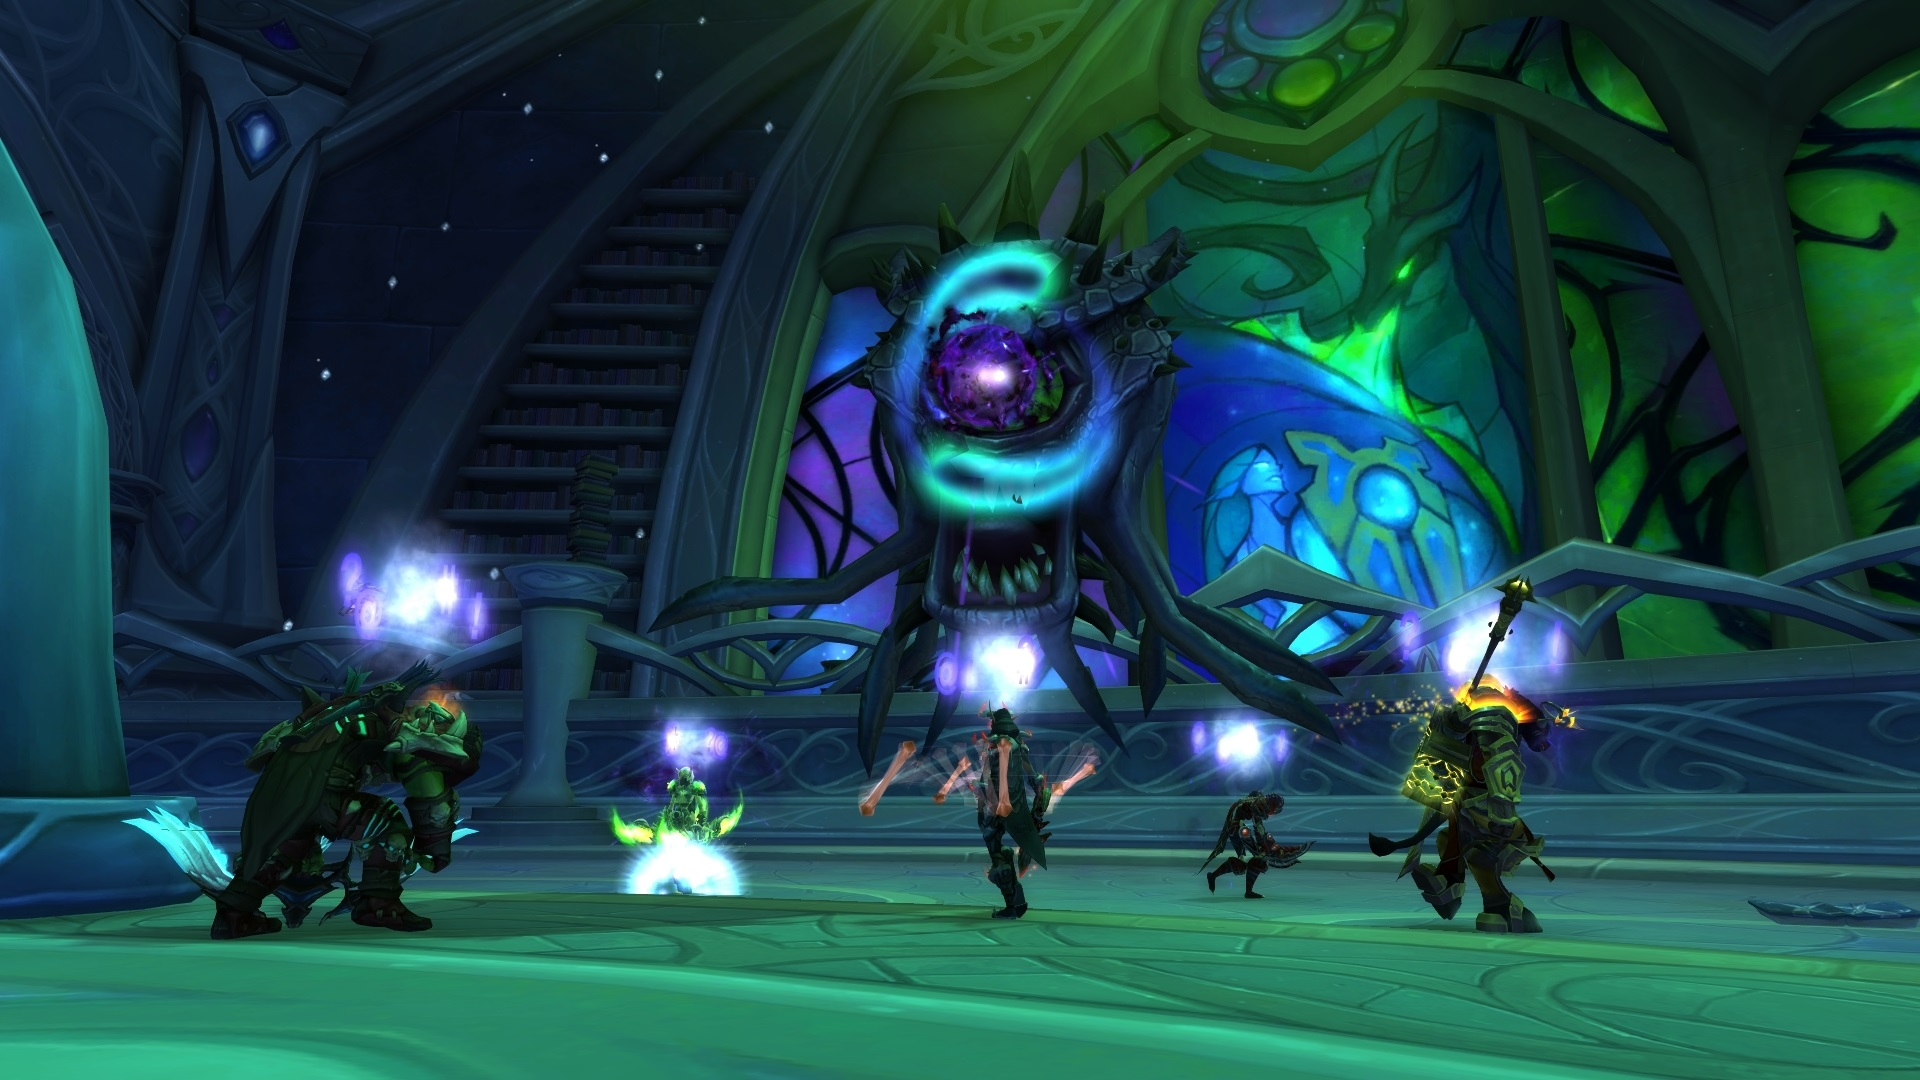 World of Warcraft tomb of sargeras